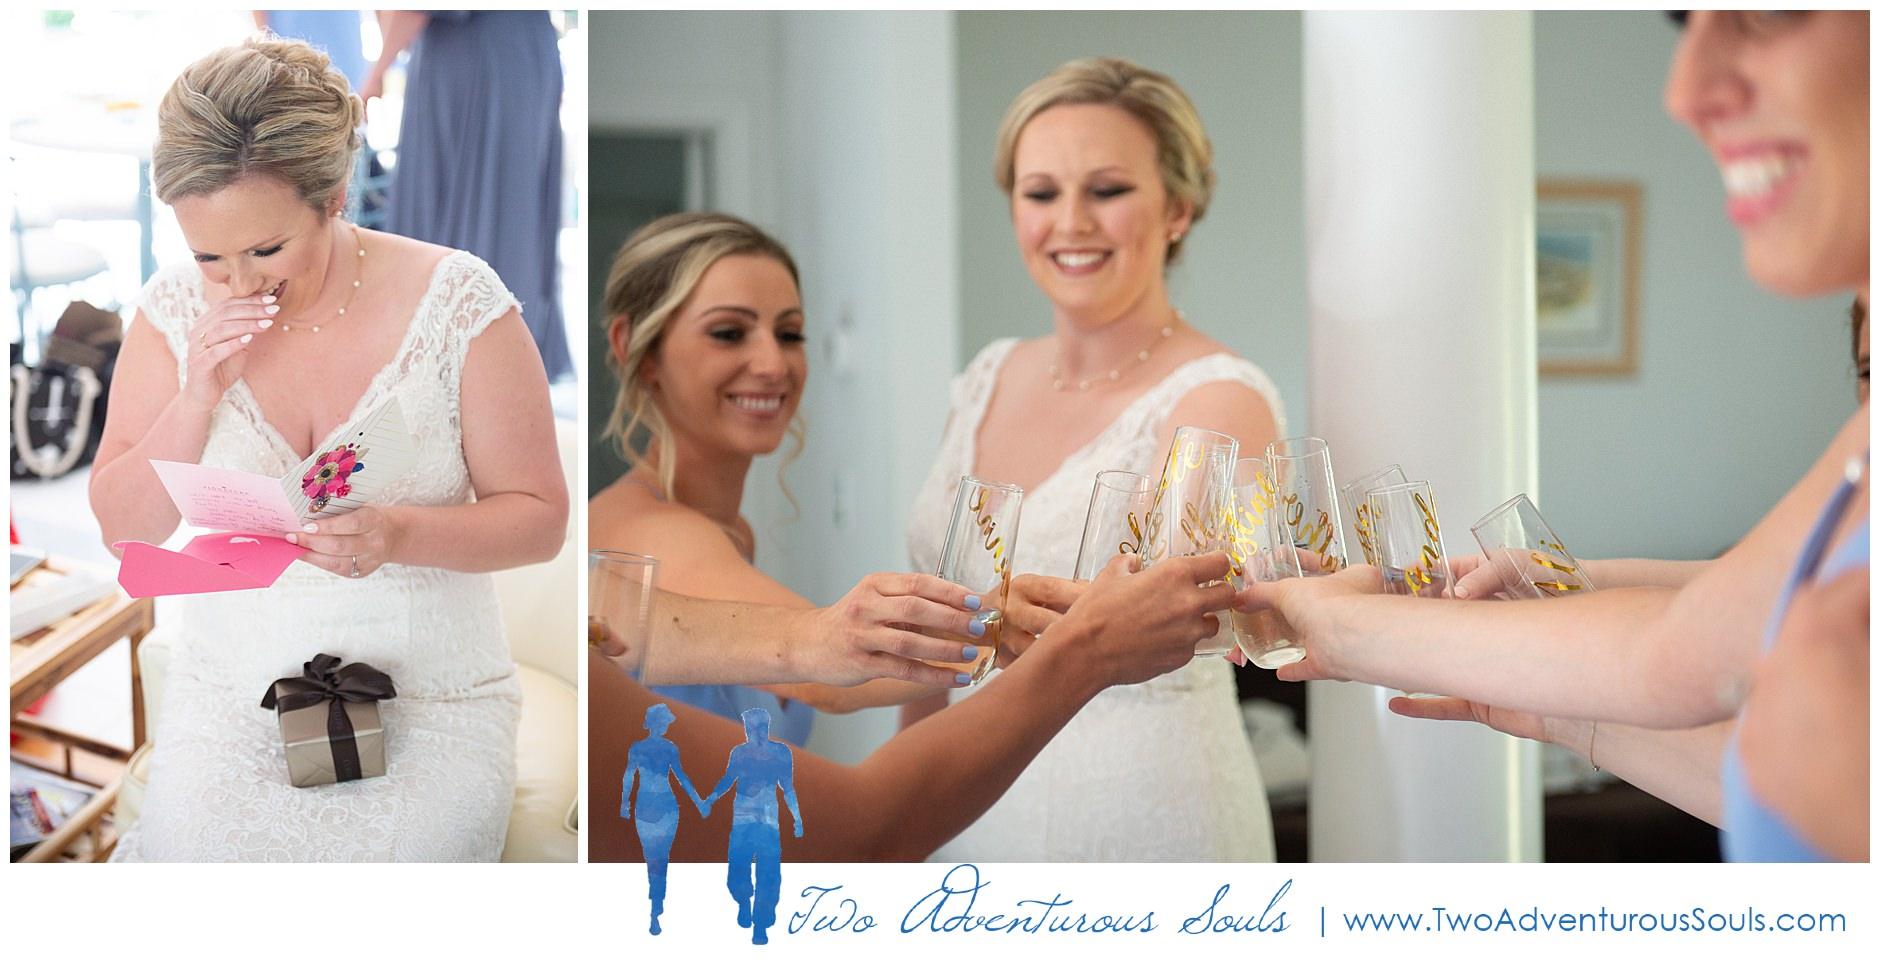 Cape Cod Wedding Photographers, Destination Wedding Photographers, Two Adventurous Souls-081019_0012.jpg